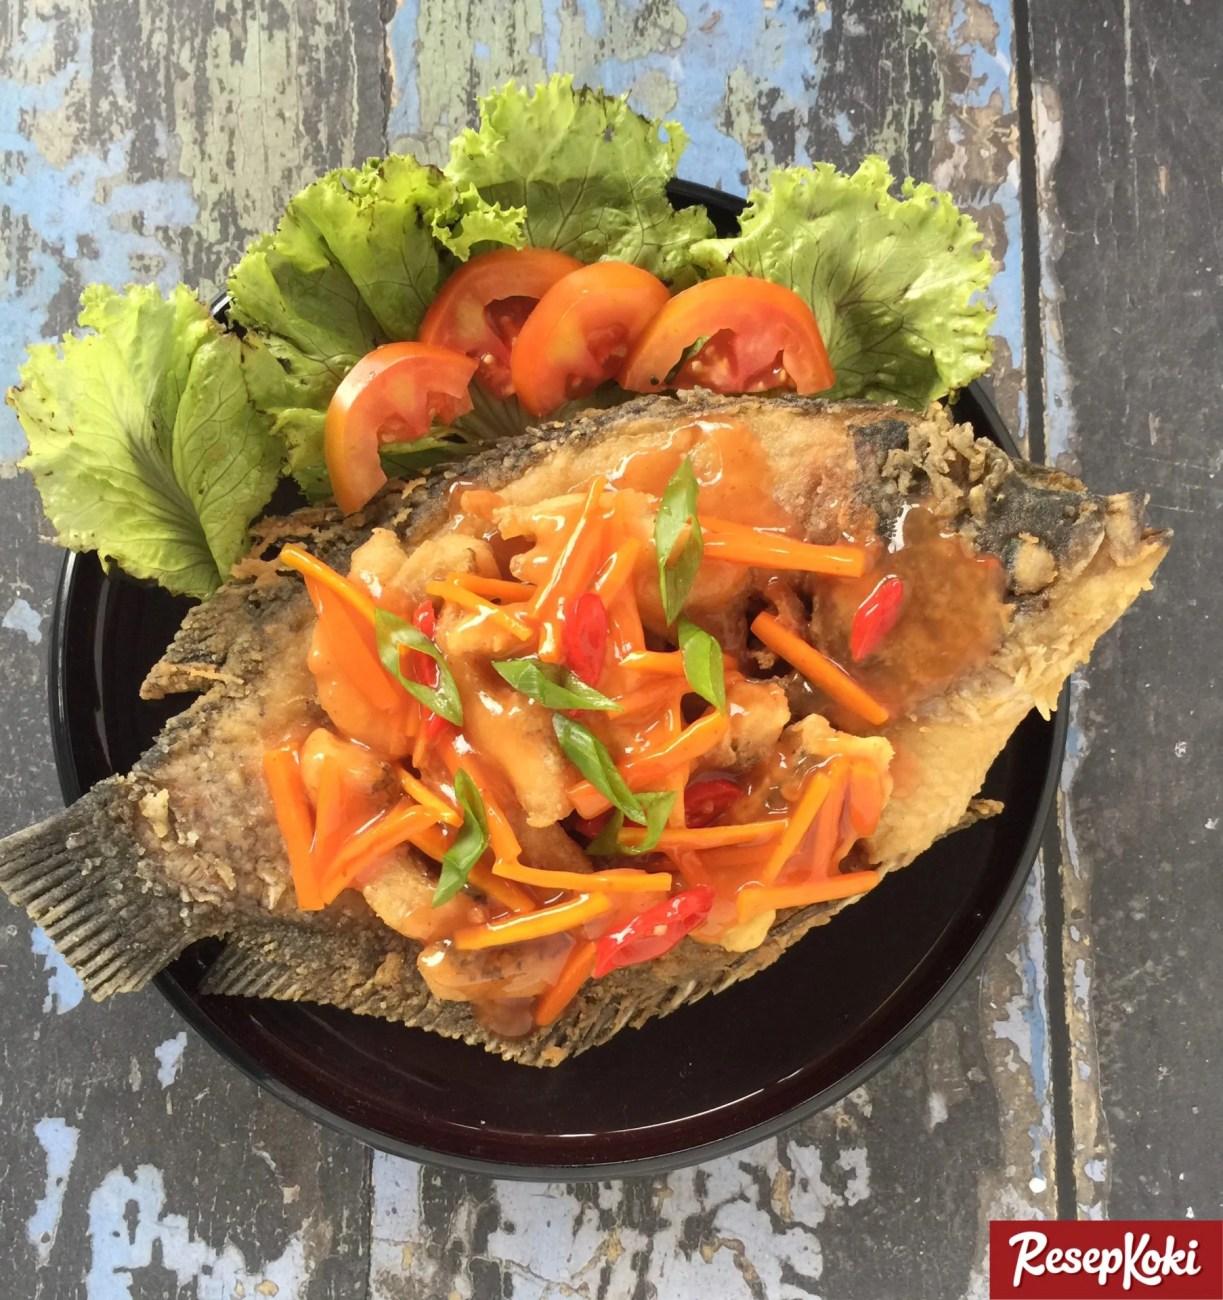 Ikan Gurame (Fillet) Asam Manis Juara - Resep   ResepKoki